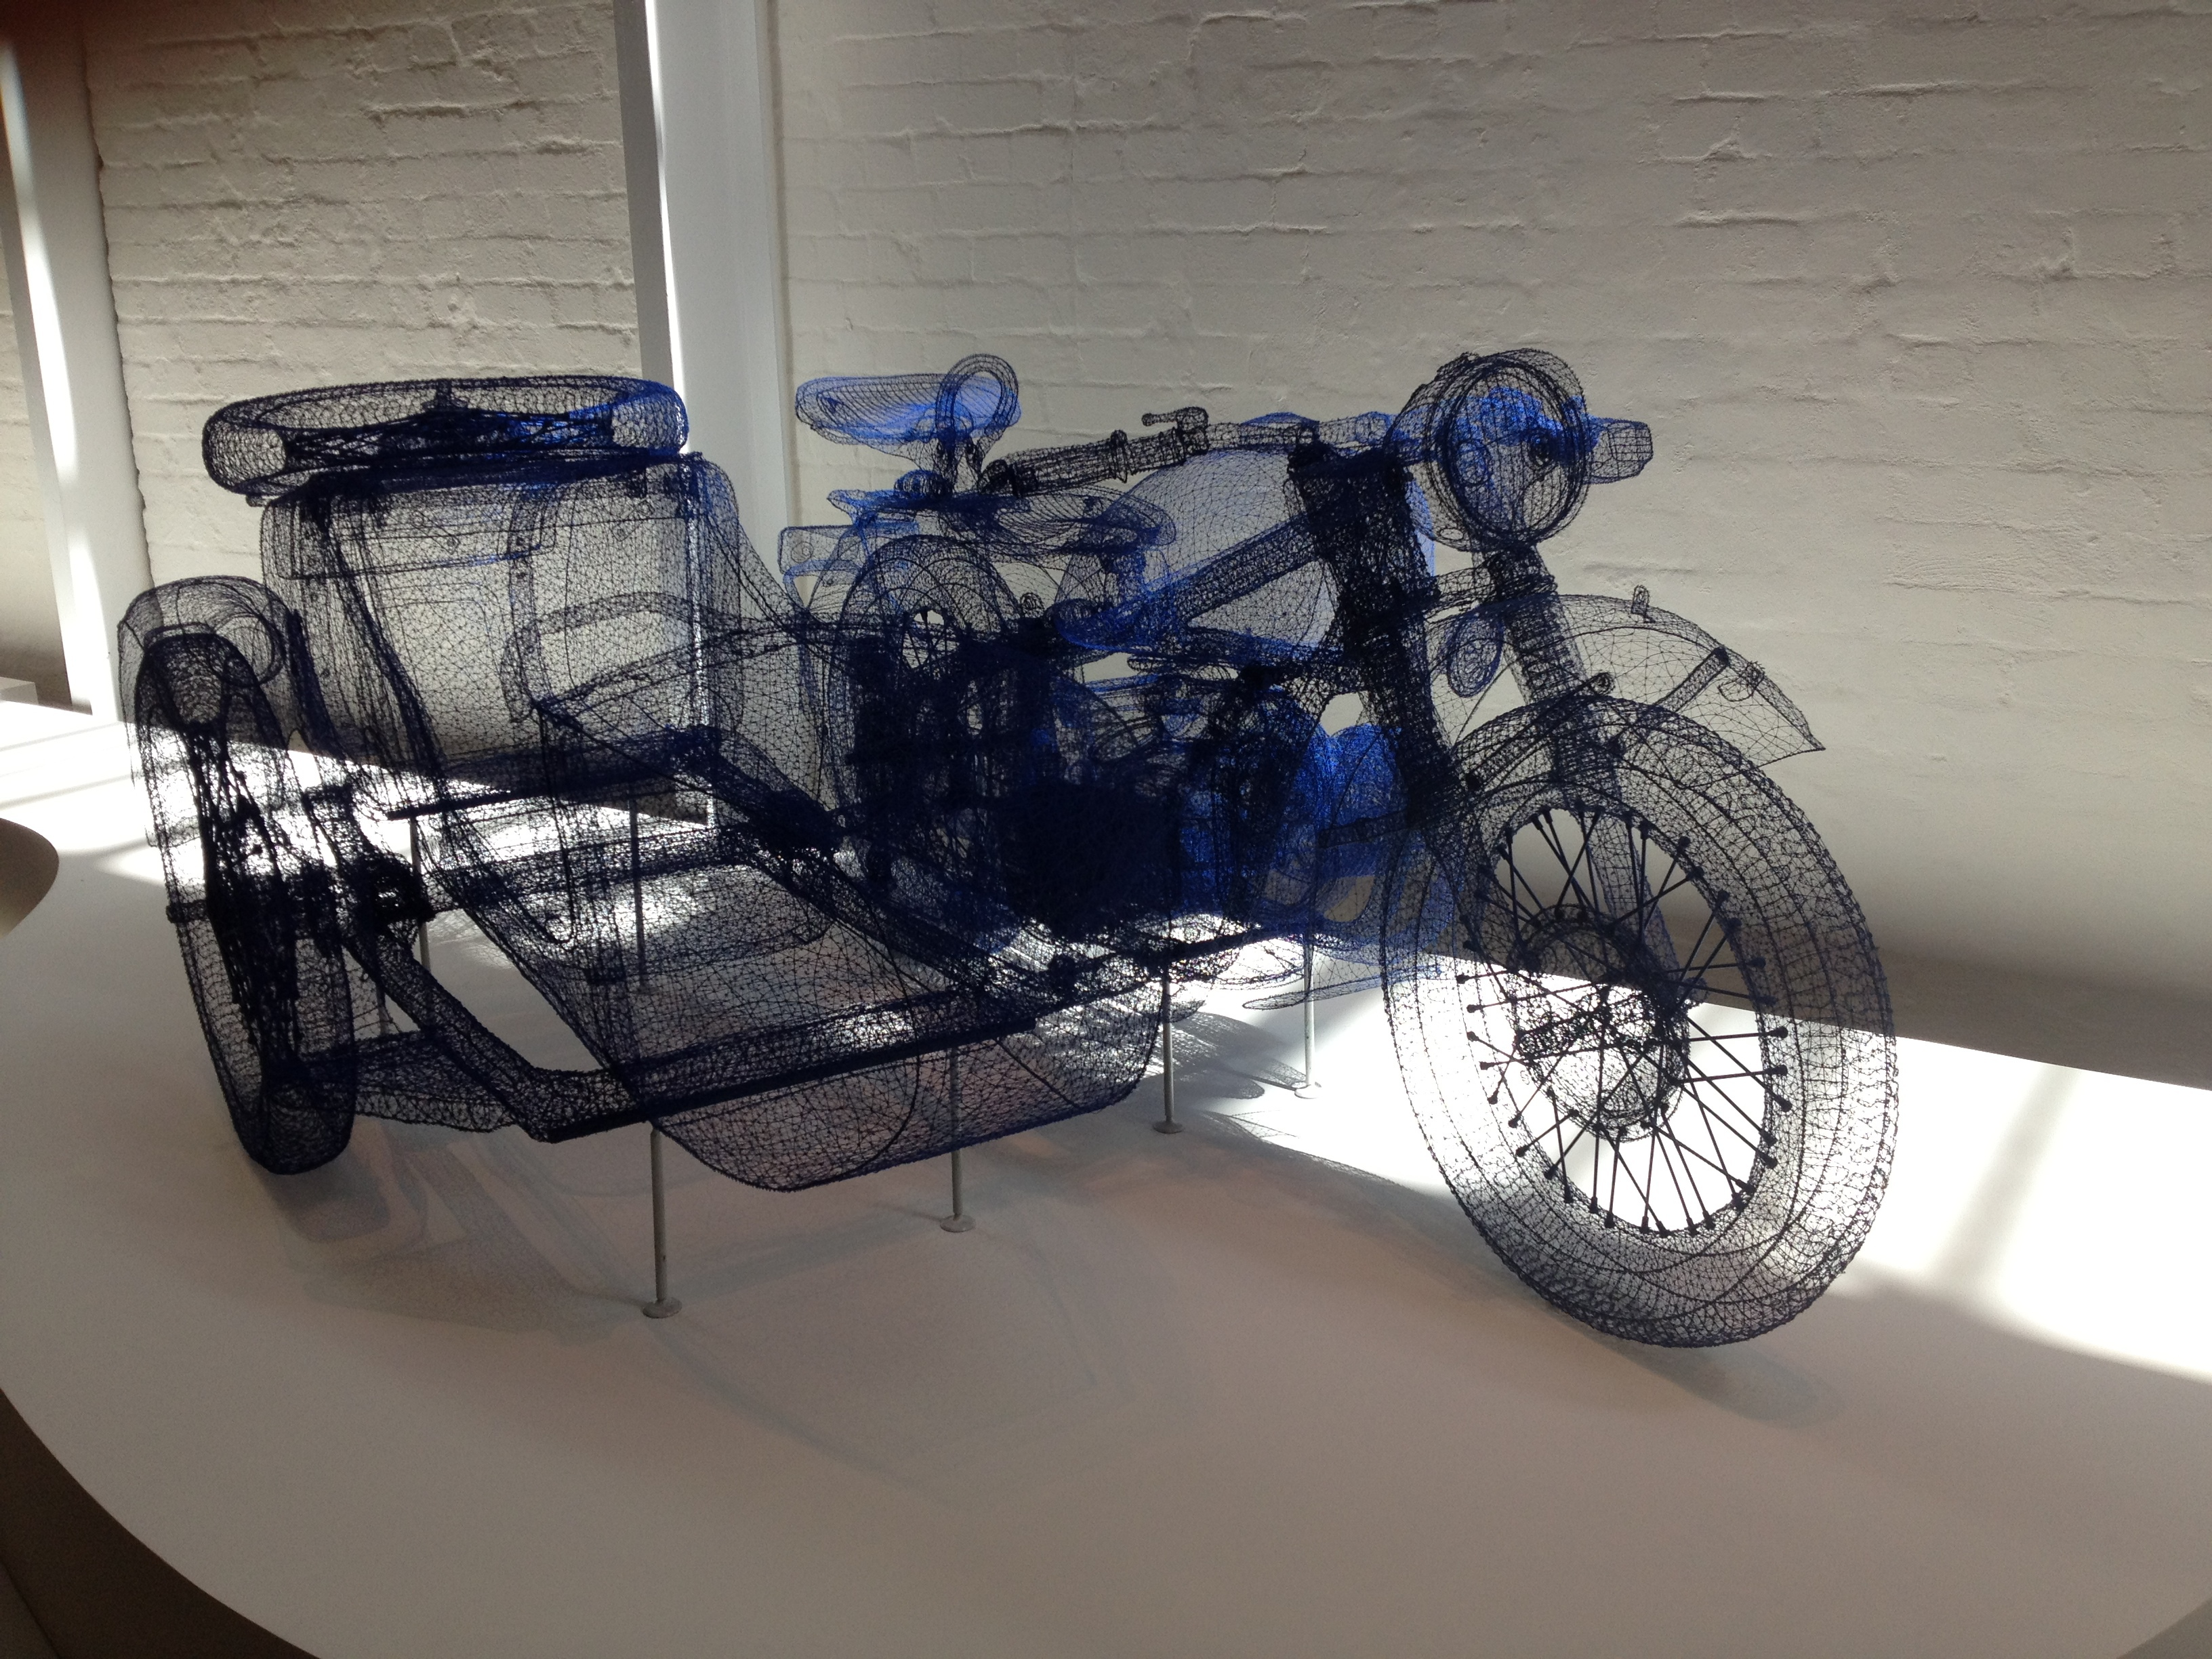 'Blue CJ750' by Shi Jindian – wire sculpture